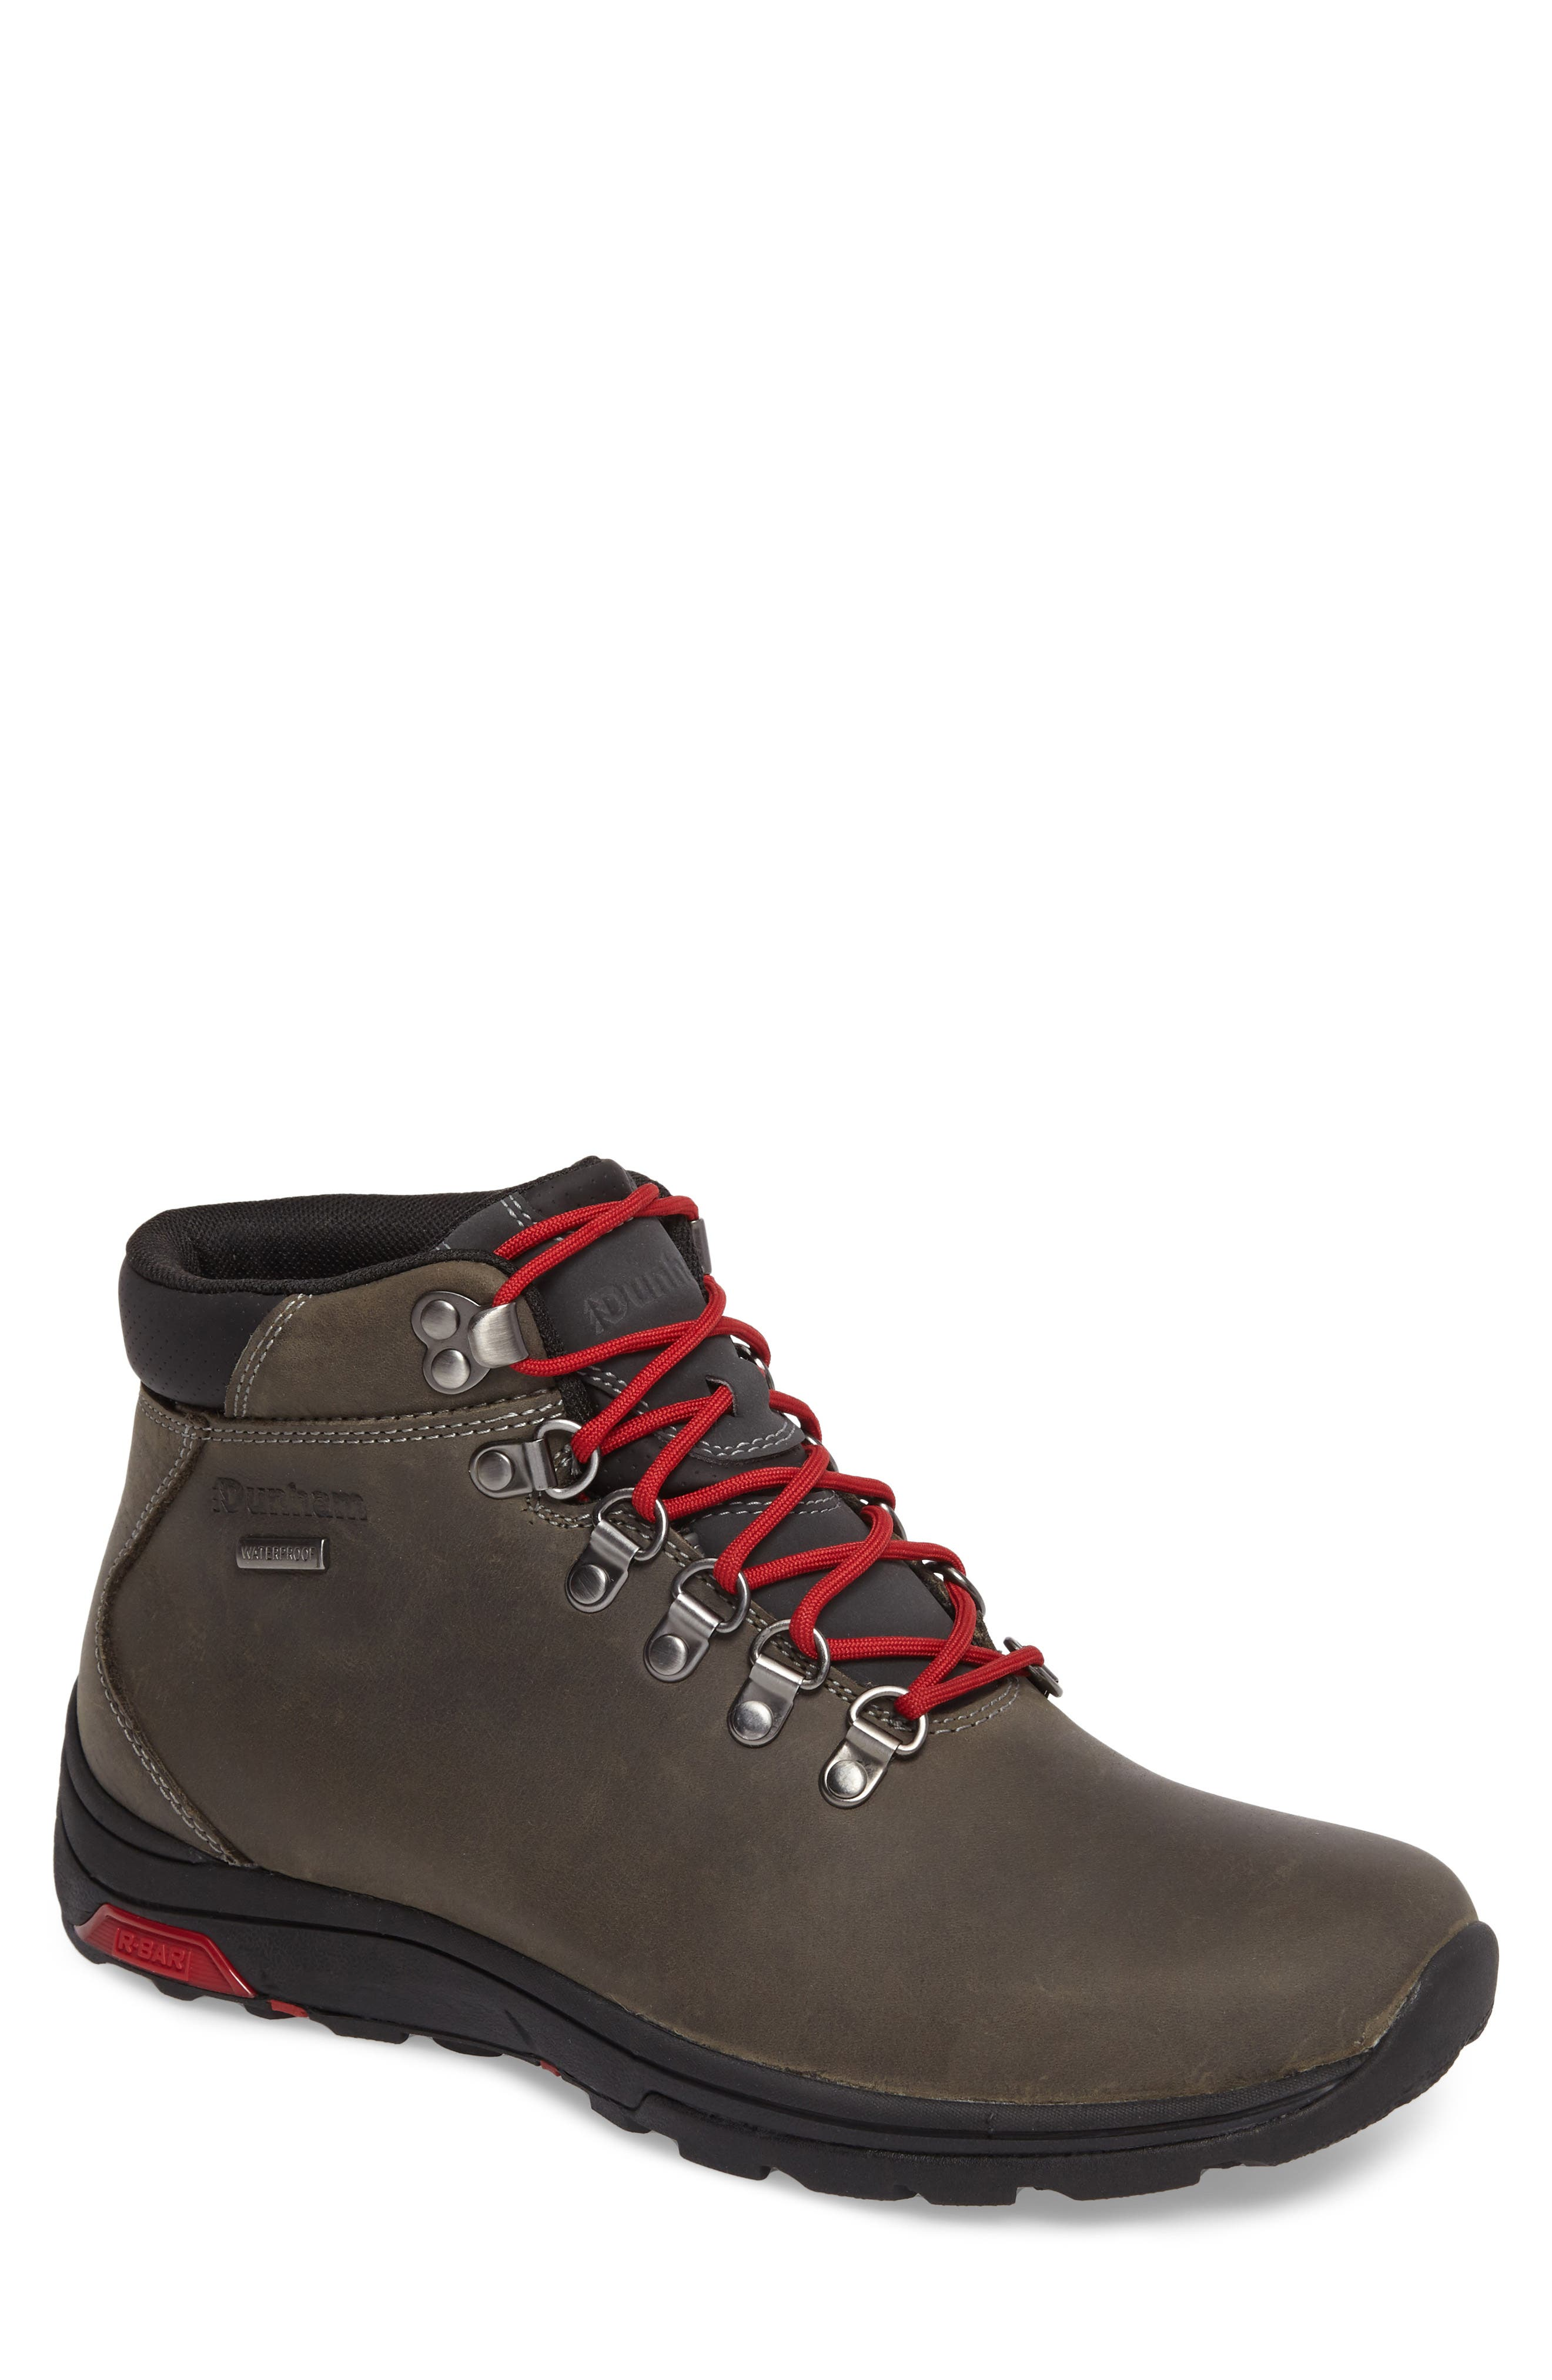 Dunham Trukka Waterproof Boot, Grey